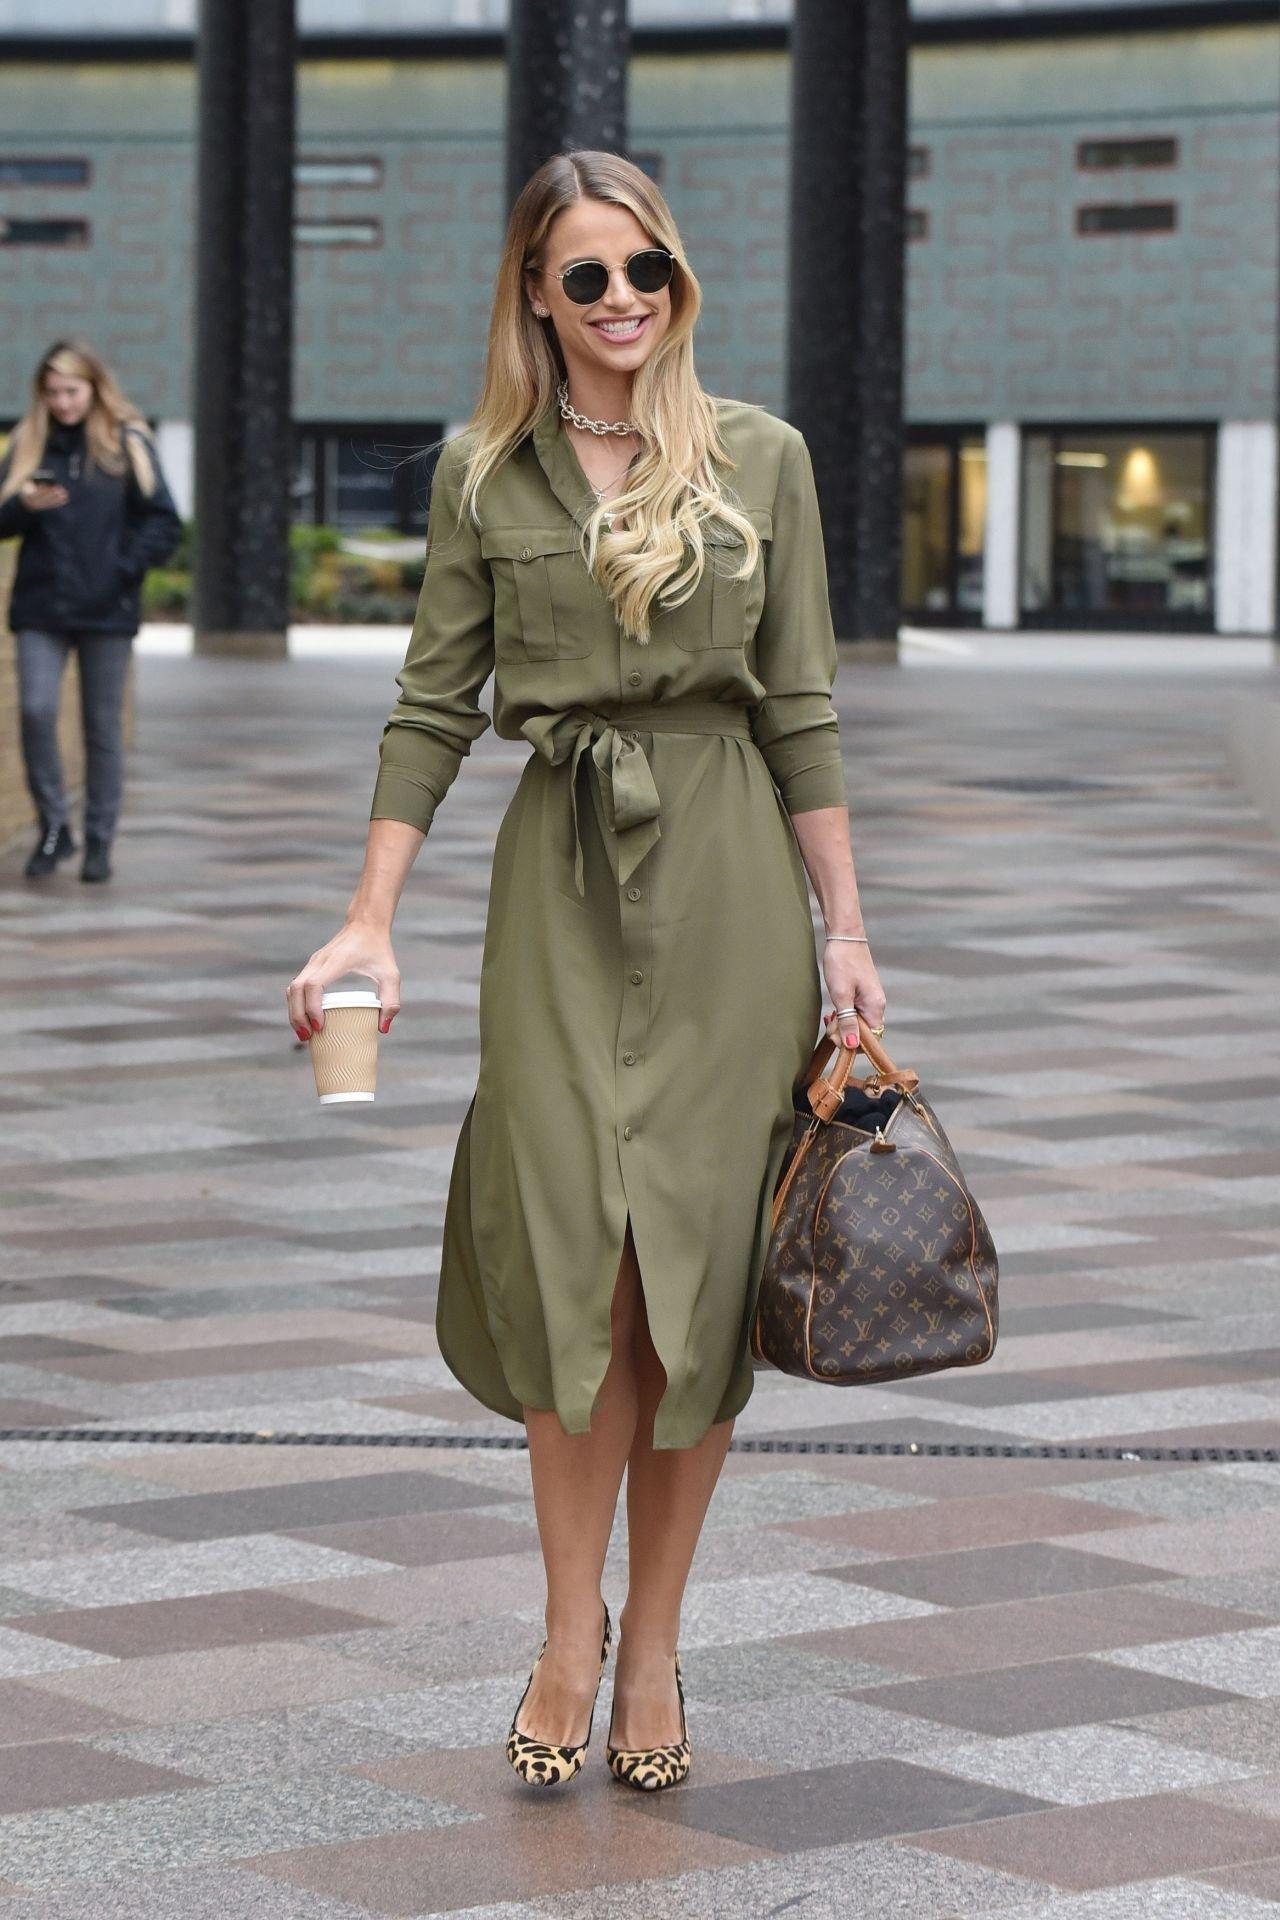 Daleela Echahly Street Fashion: Leaving The ITV Studios In London 02/05/2019